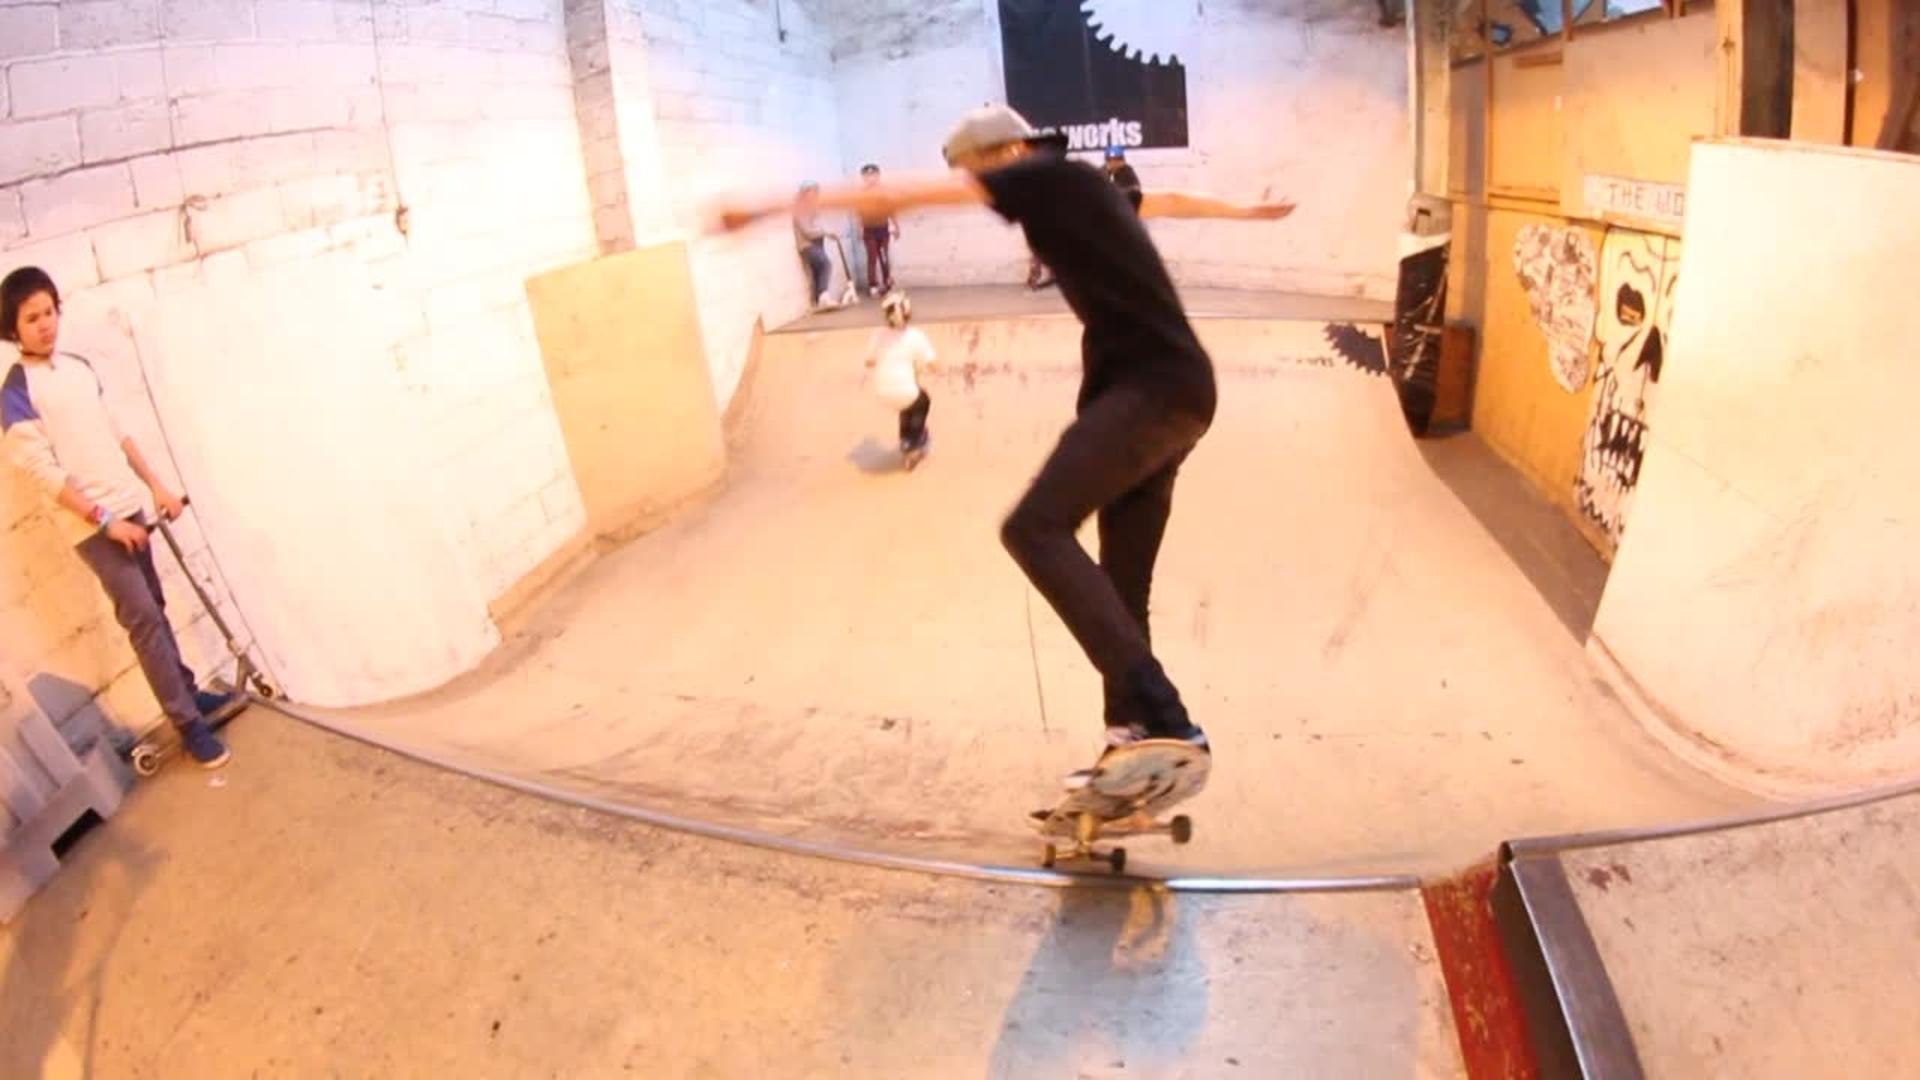 skateboarding jump into street hits spectator jukin media